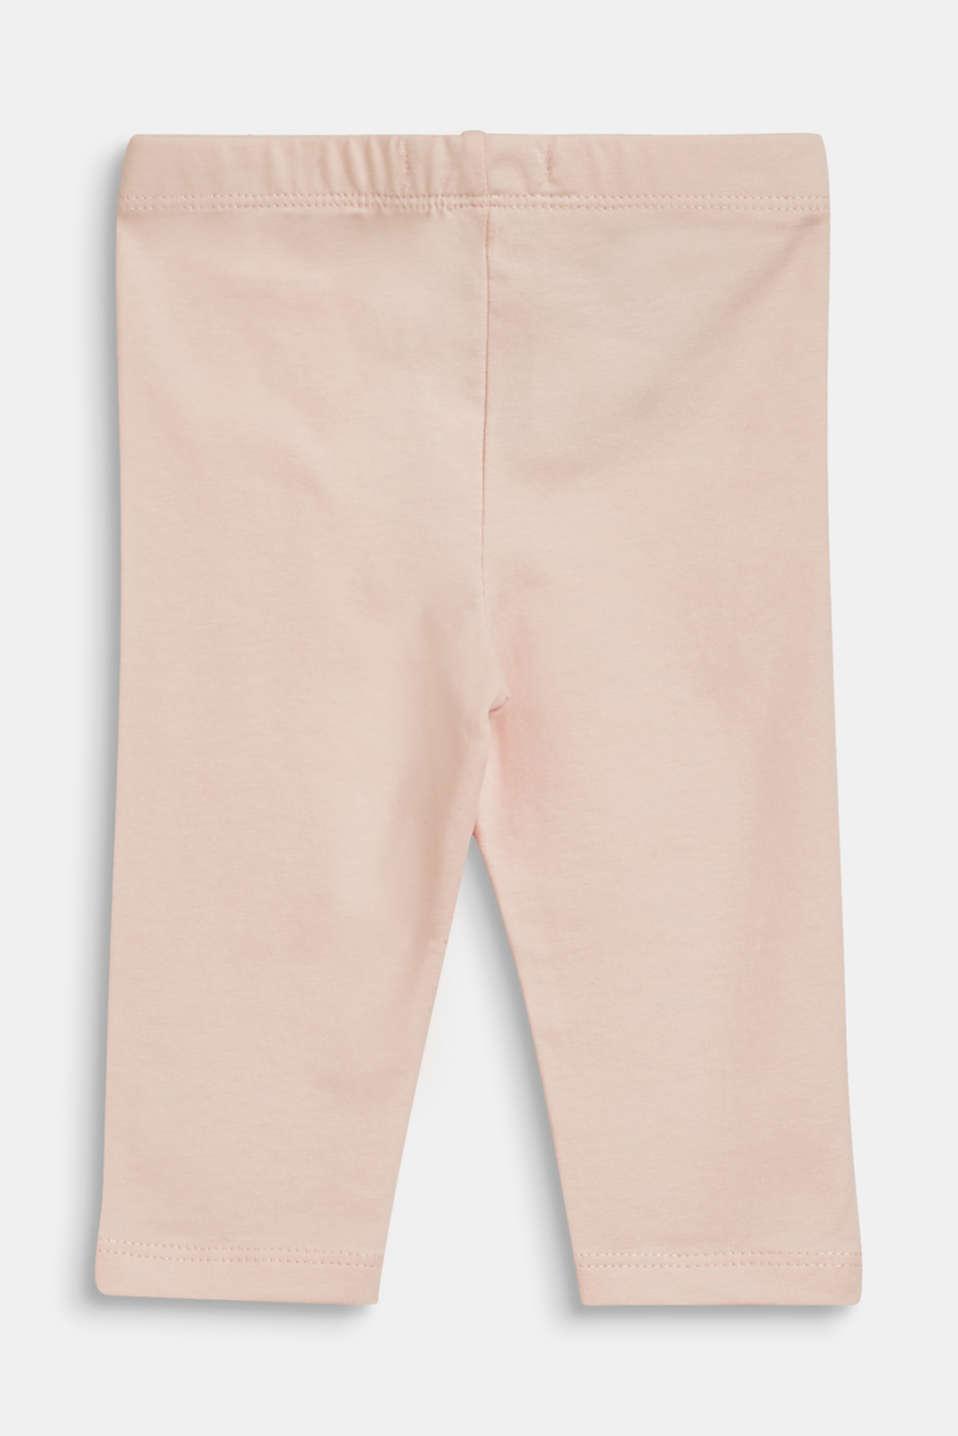 Pants knitted, LCBLUSH, detail image number 1